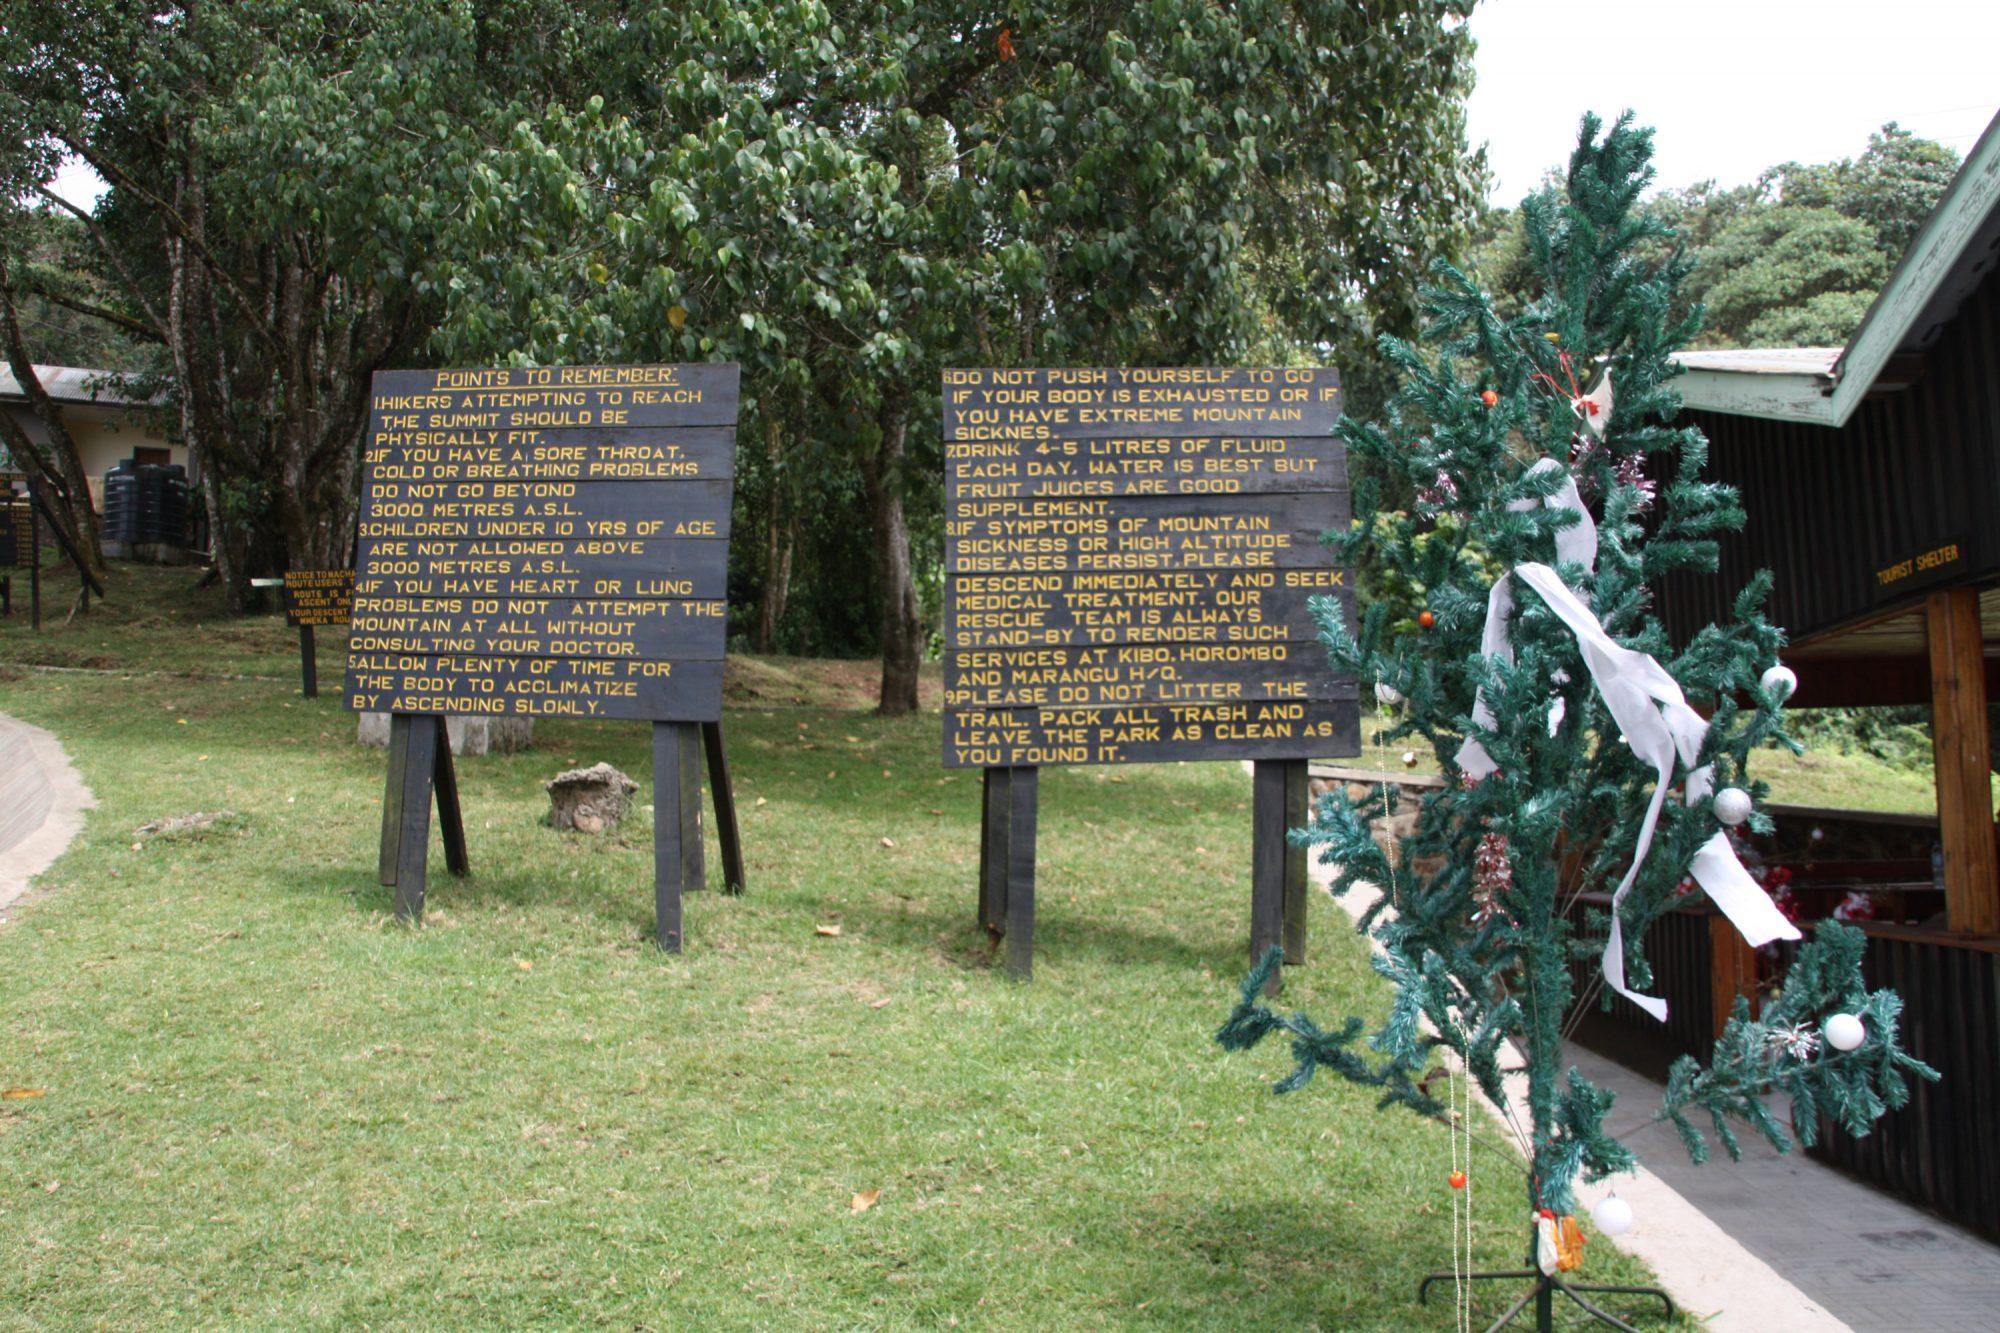 Machame Gate, Regeln, Kilimandscharo, Kilimandscharo besteigen, Tansania, Afrika, Kilimandscharo Tour, Erfahrungsbericht, Machame Route